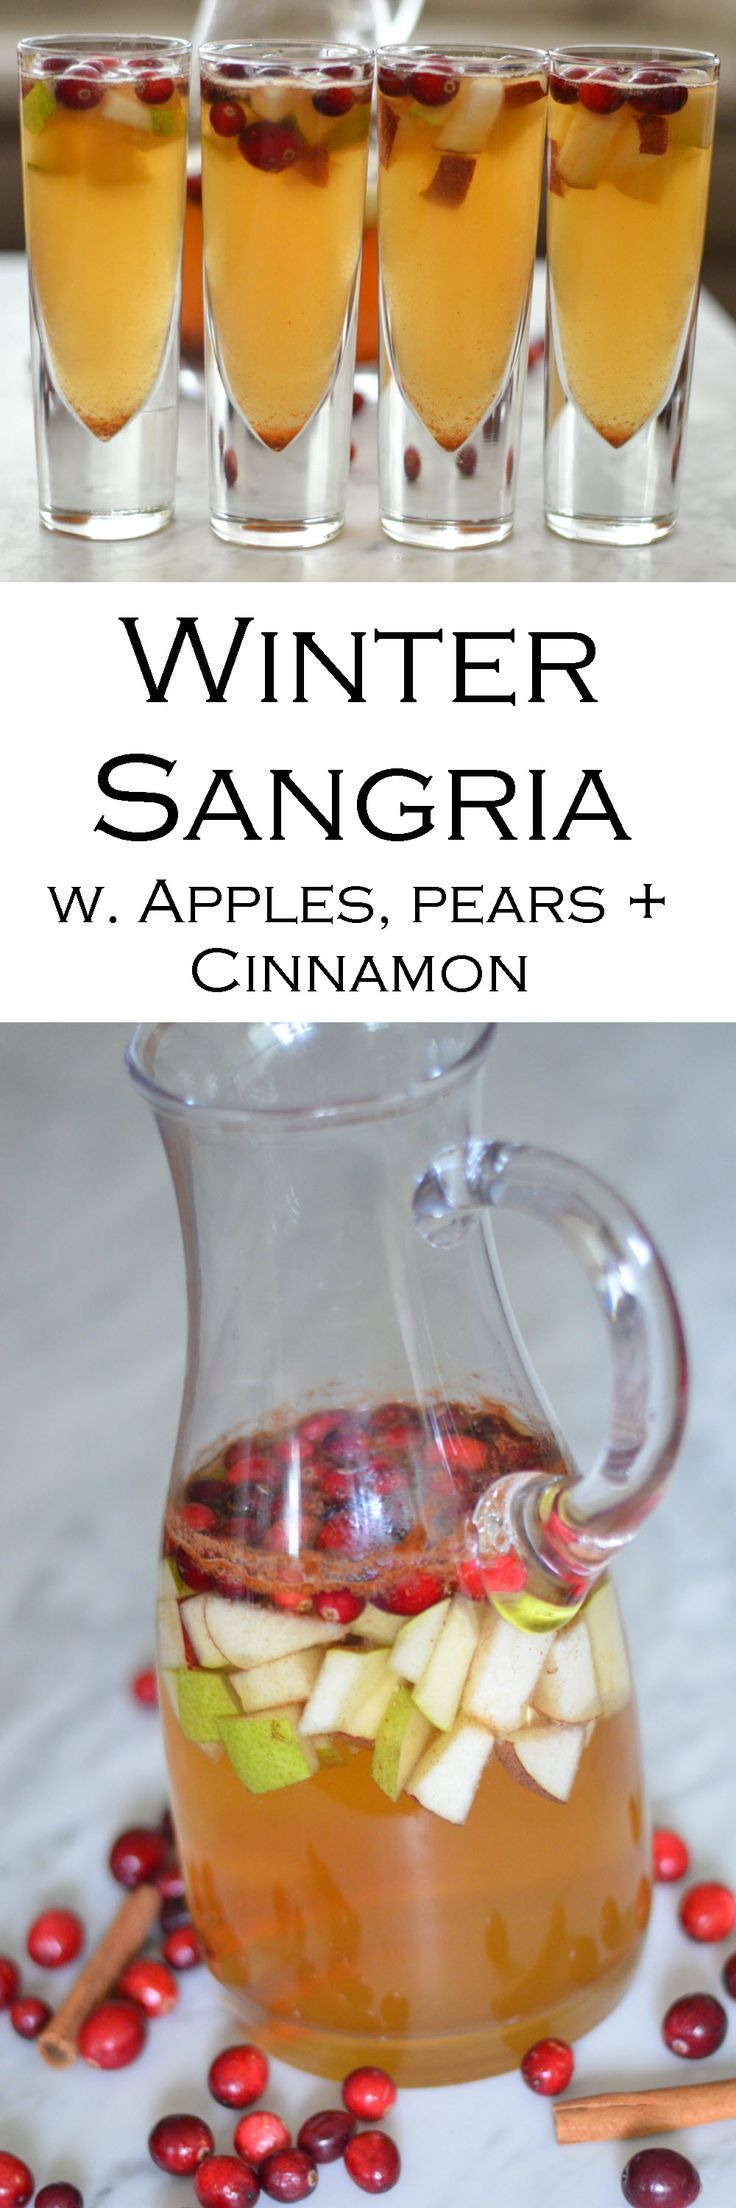 Winter Sangria w. Apples, Pear + Cinnamon